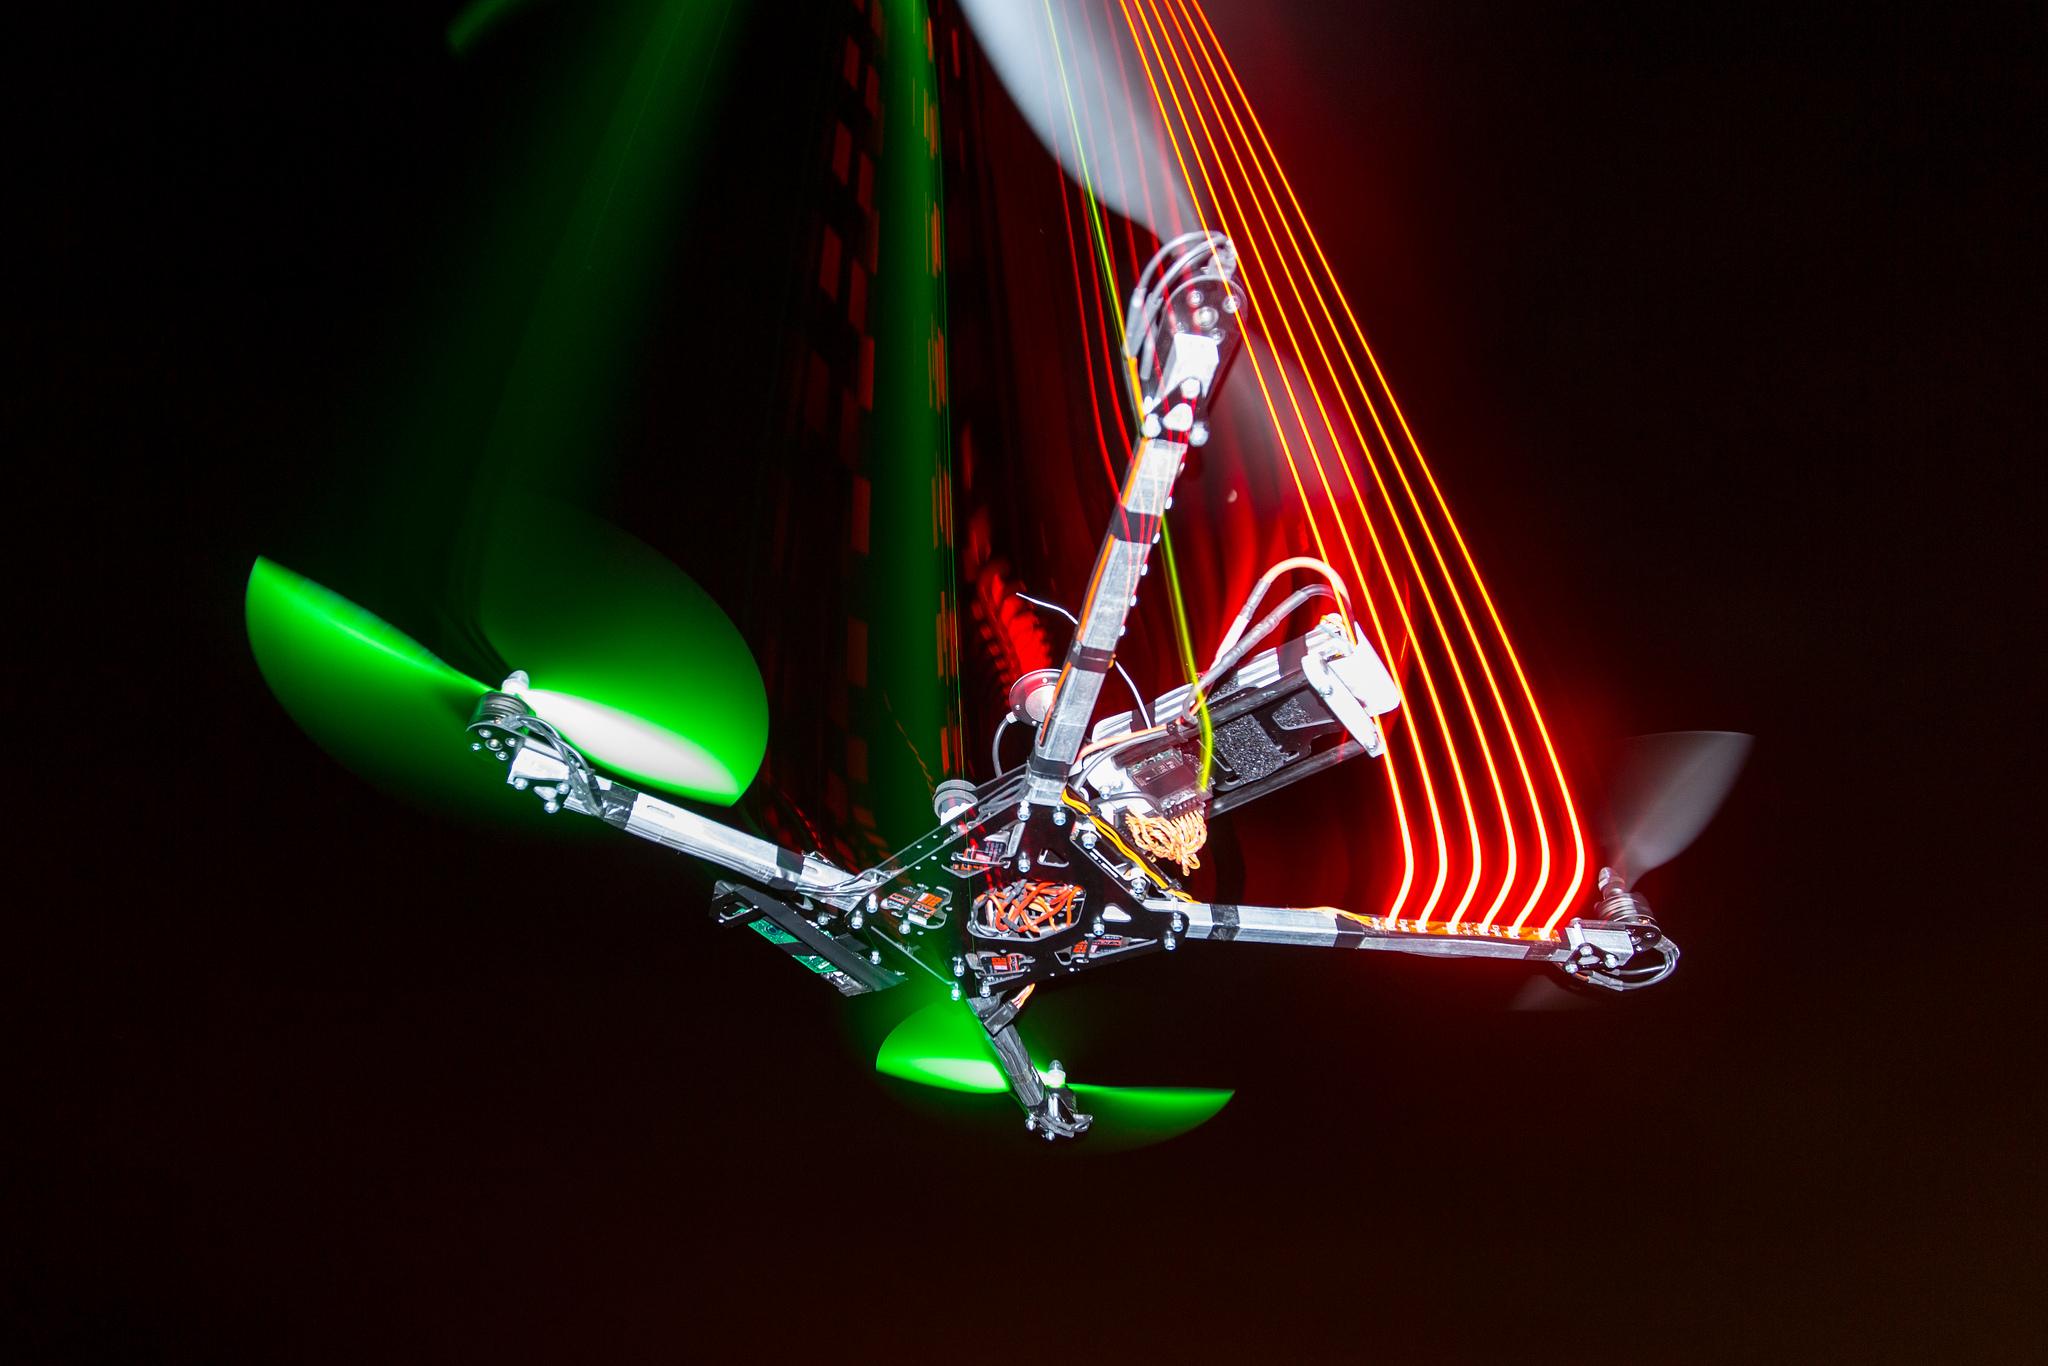 Quadcopter - Spidex, Carsten Frenzl January 19, 2013